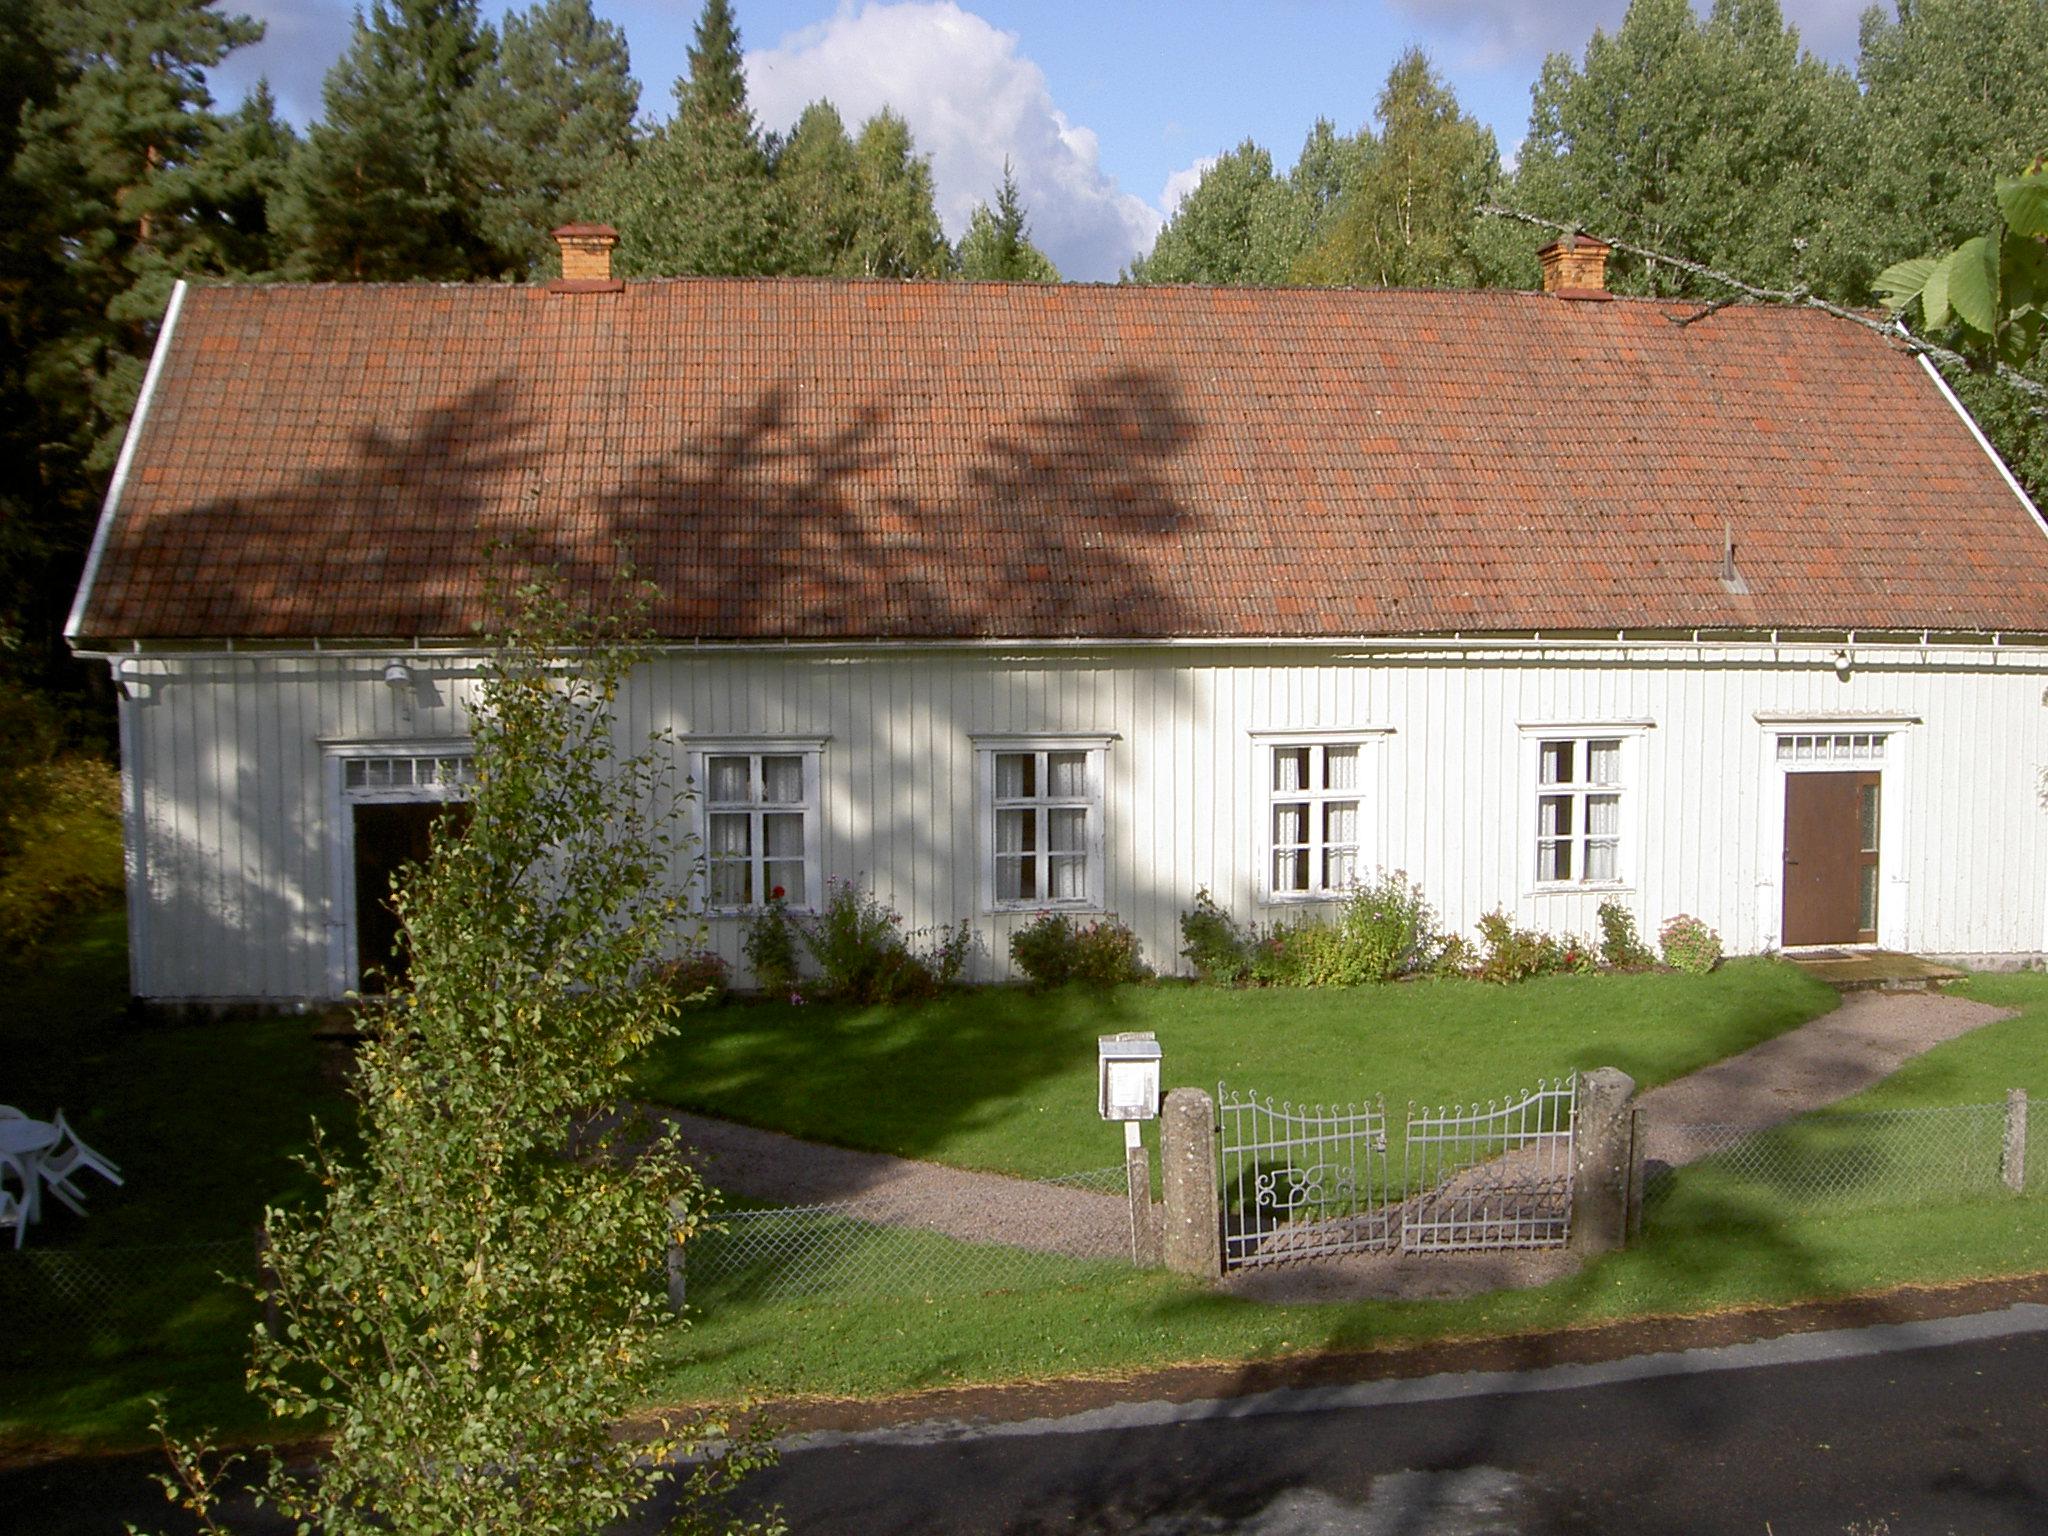 Åsens missionshus 007